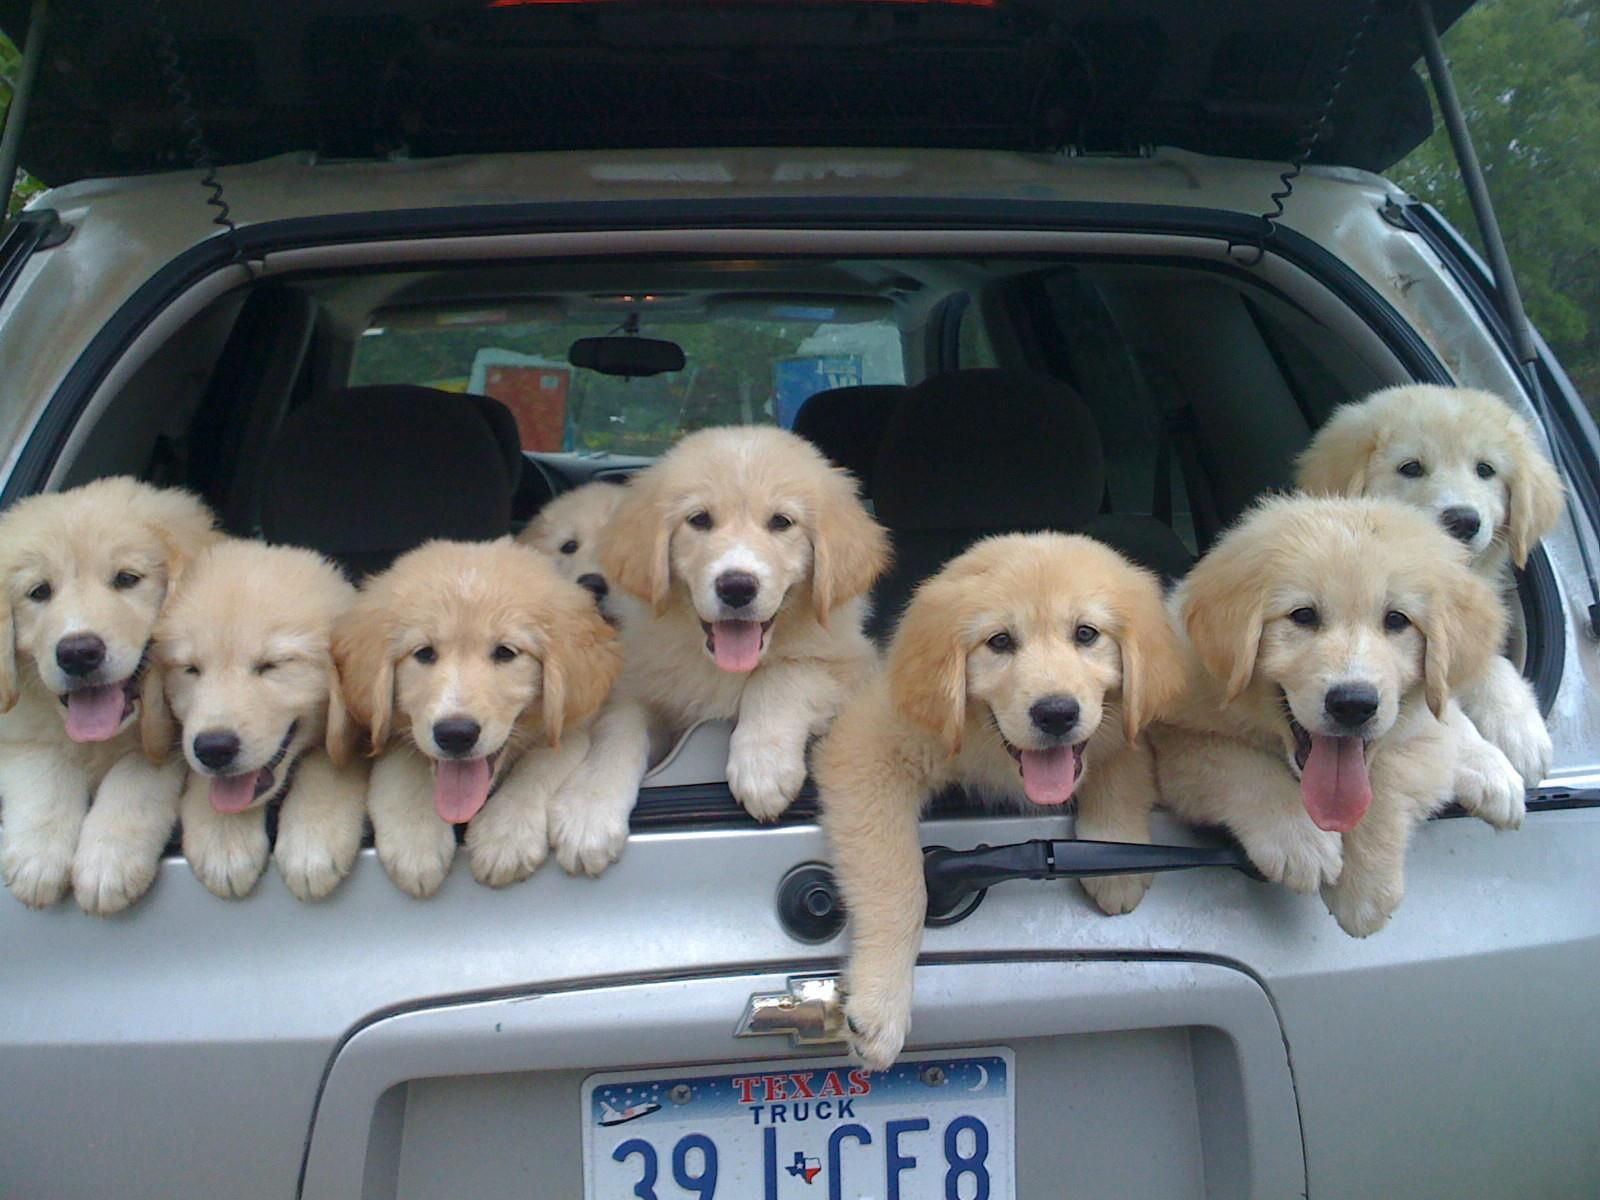 28 Pictures Of Golden Retriever Puppies That Will Brighten